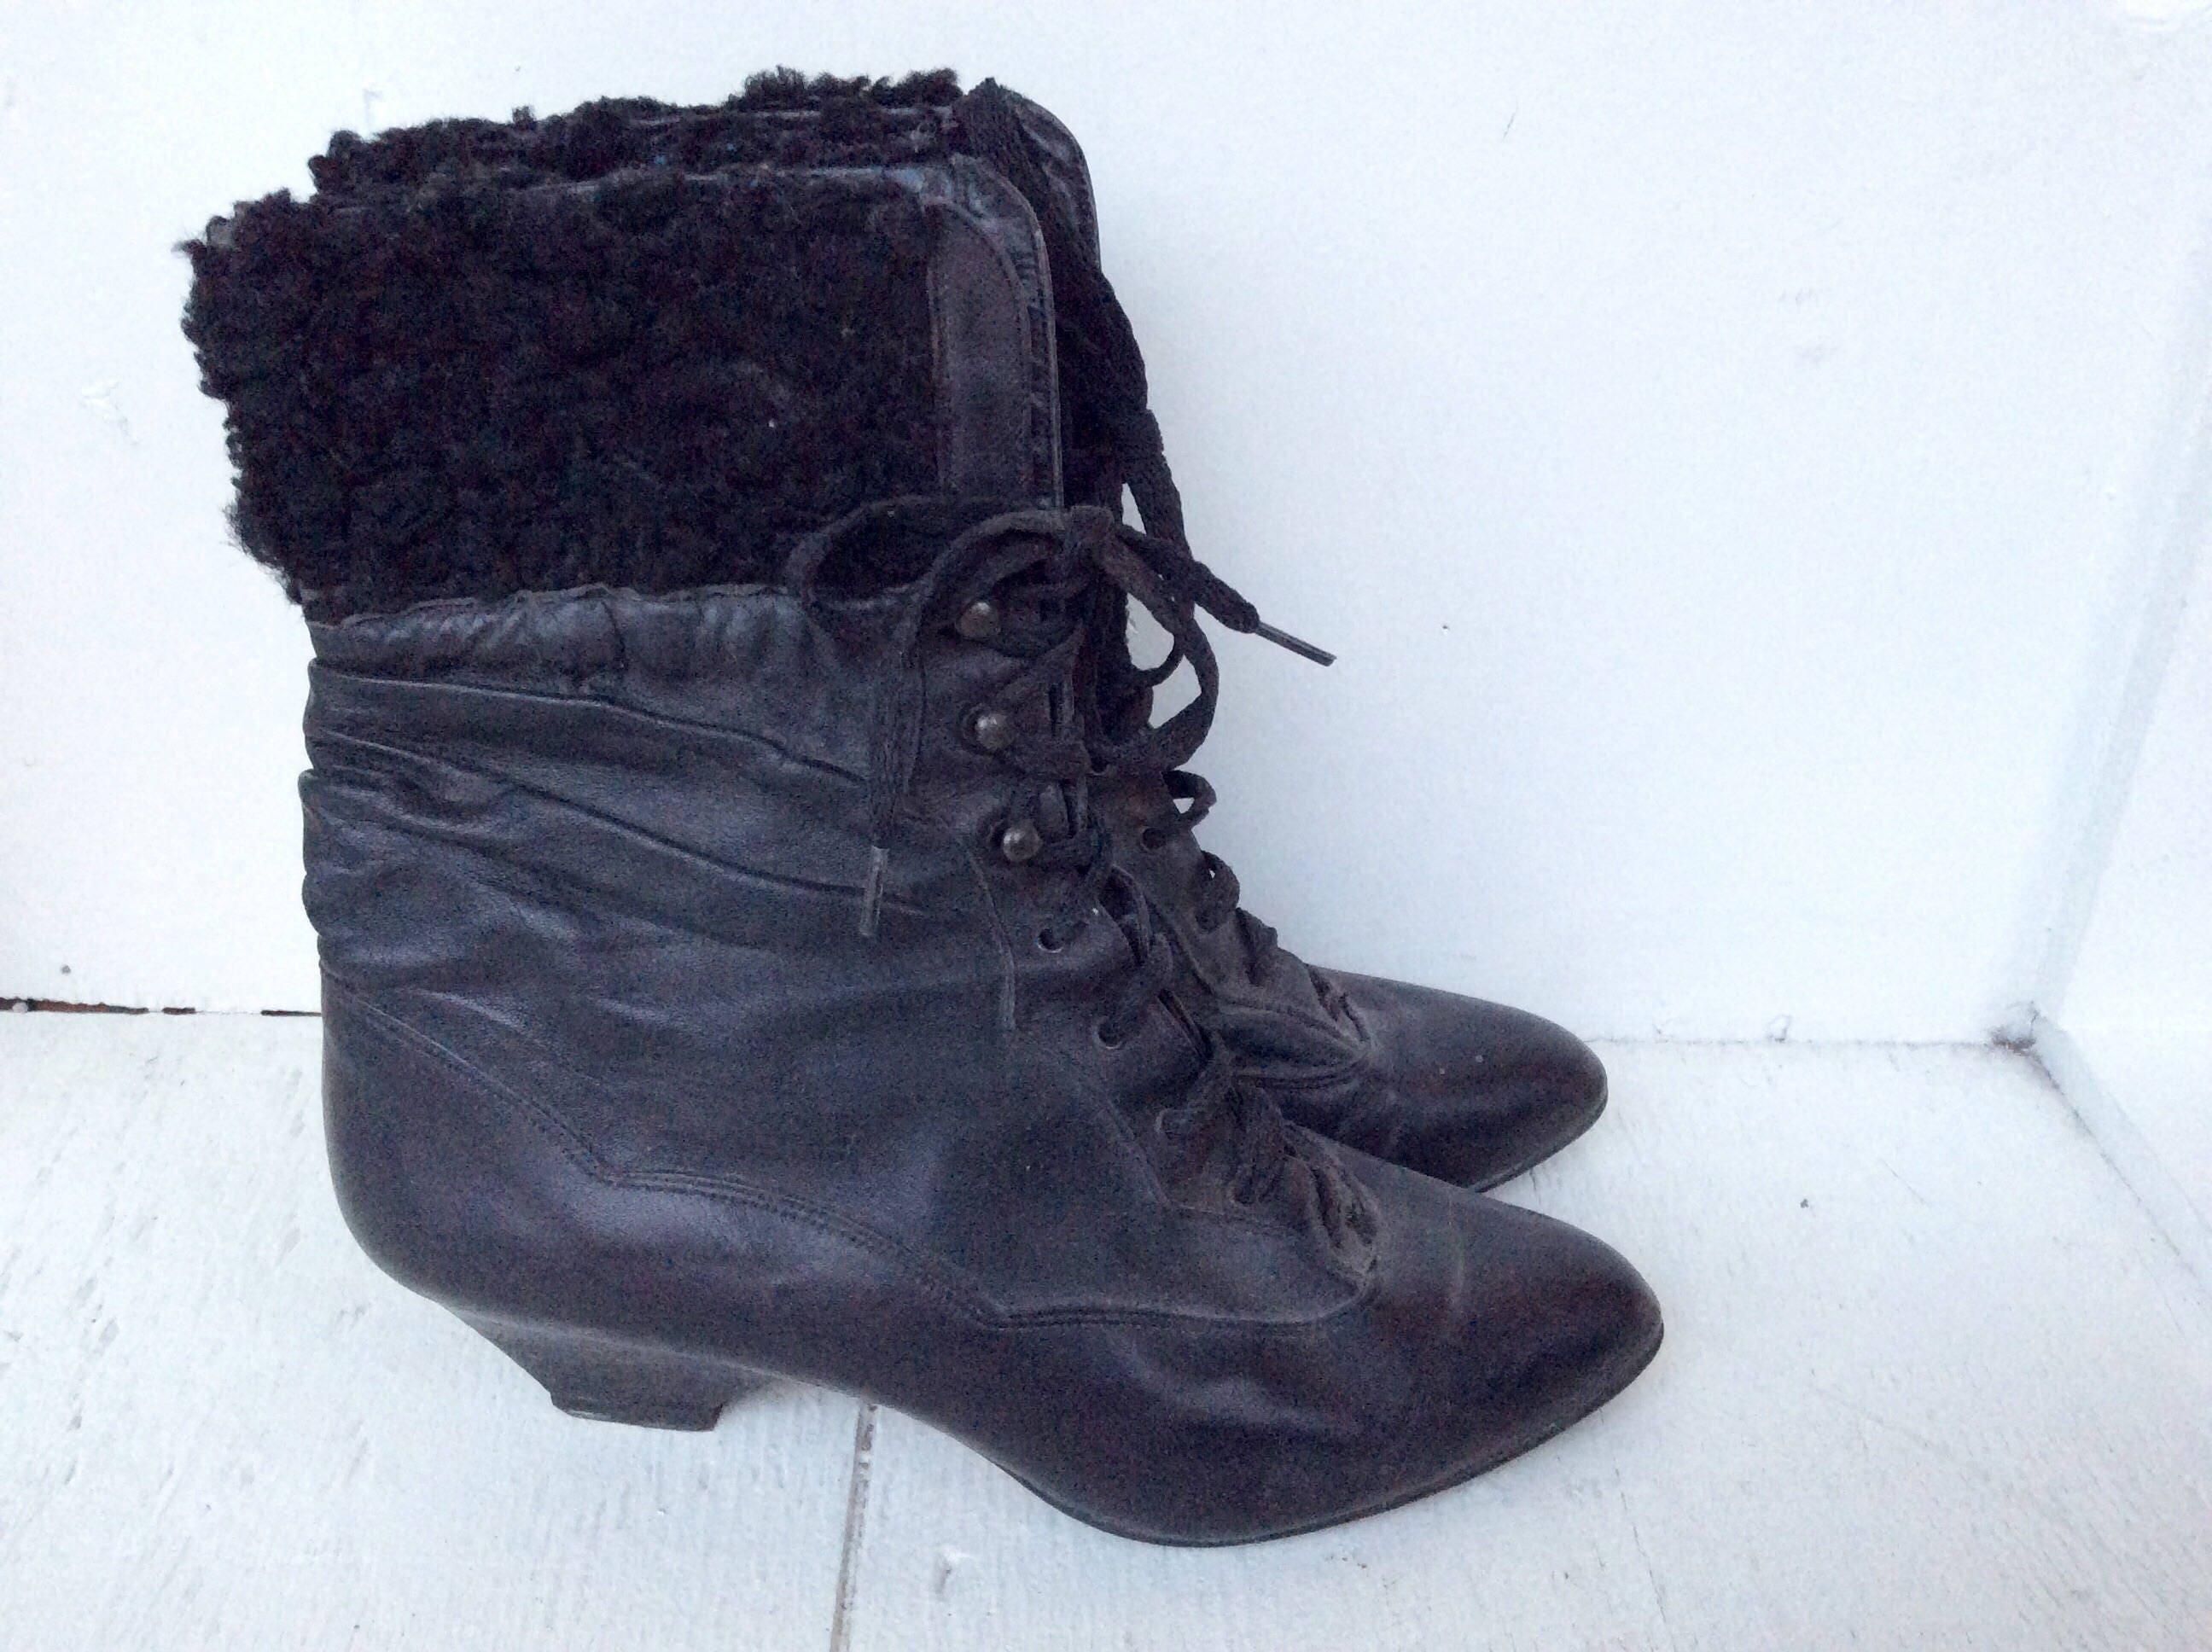 b885f0faa373d Vintage black ankle boots 6.5 / 90s ALDO sheepskin fur lace up | Etsy